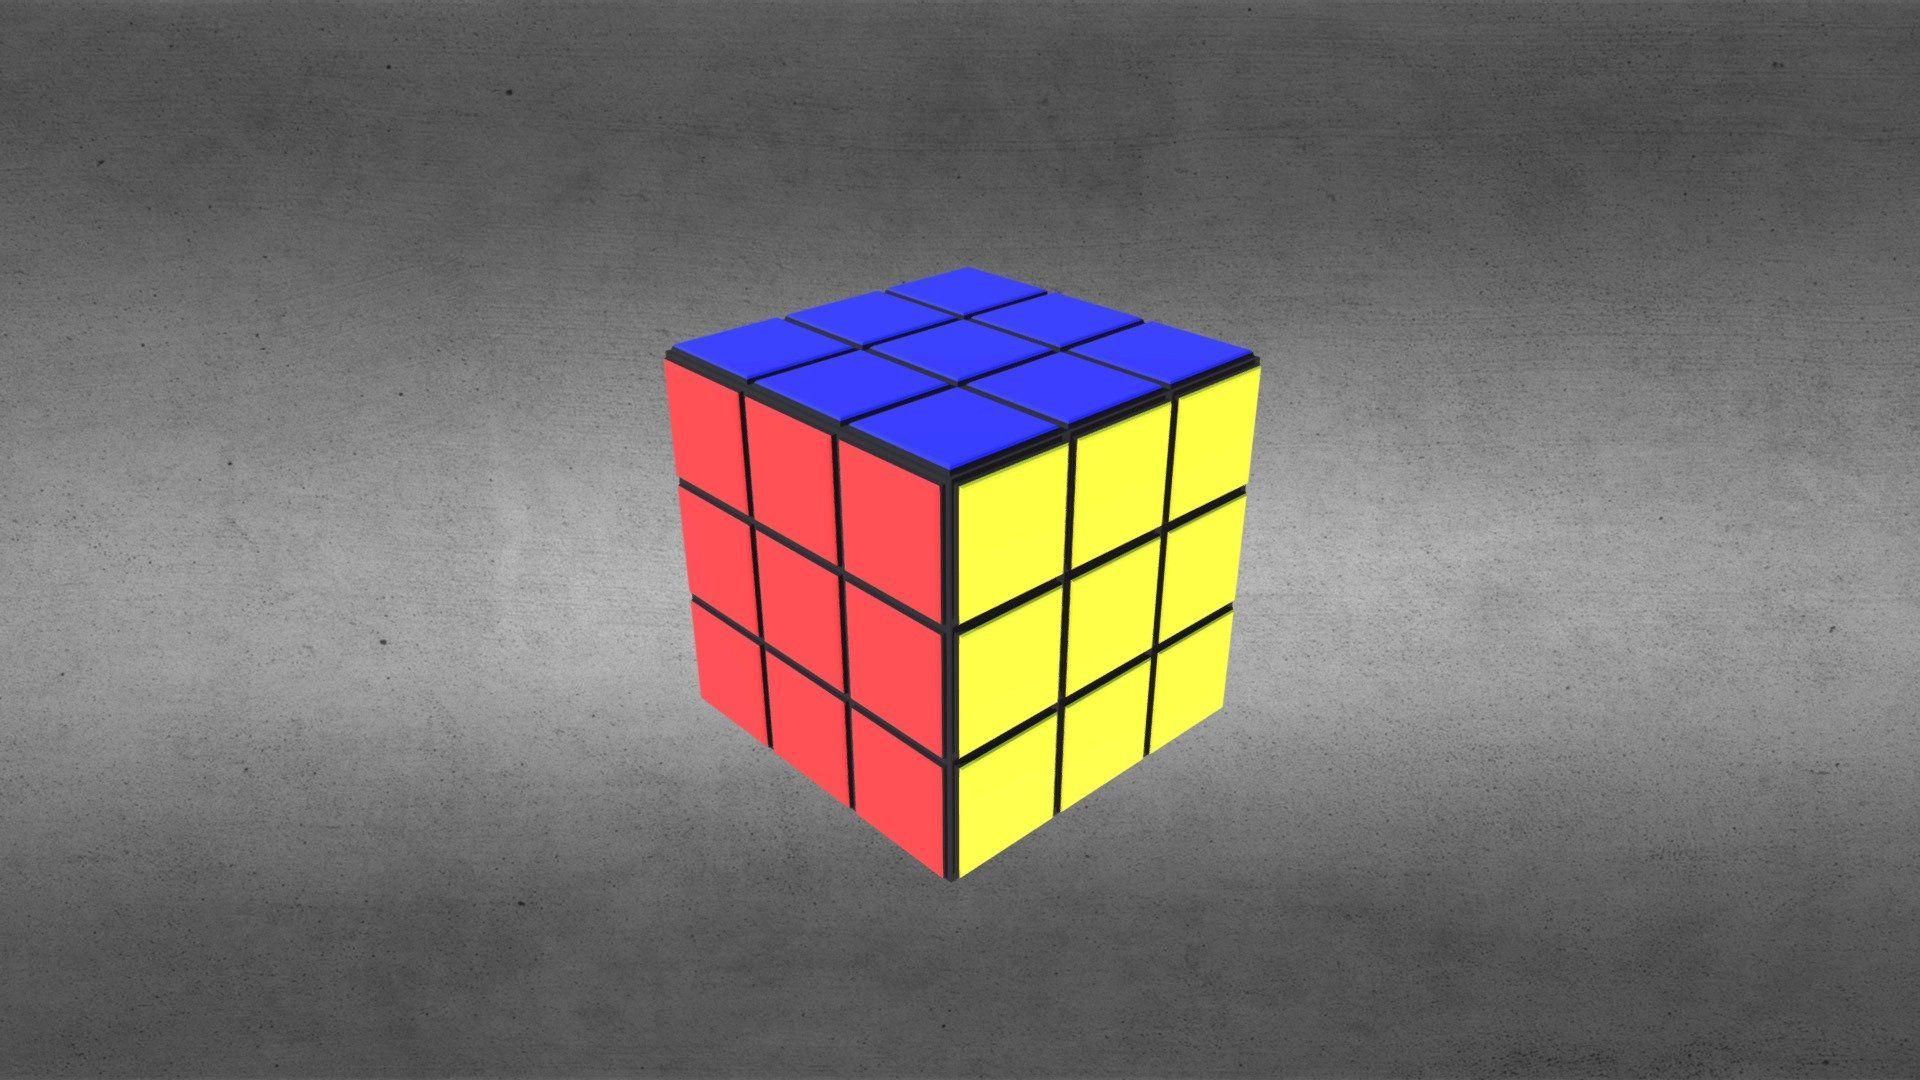 Rubiks Cube screen wallpaper